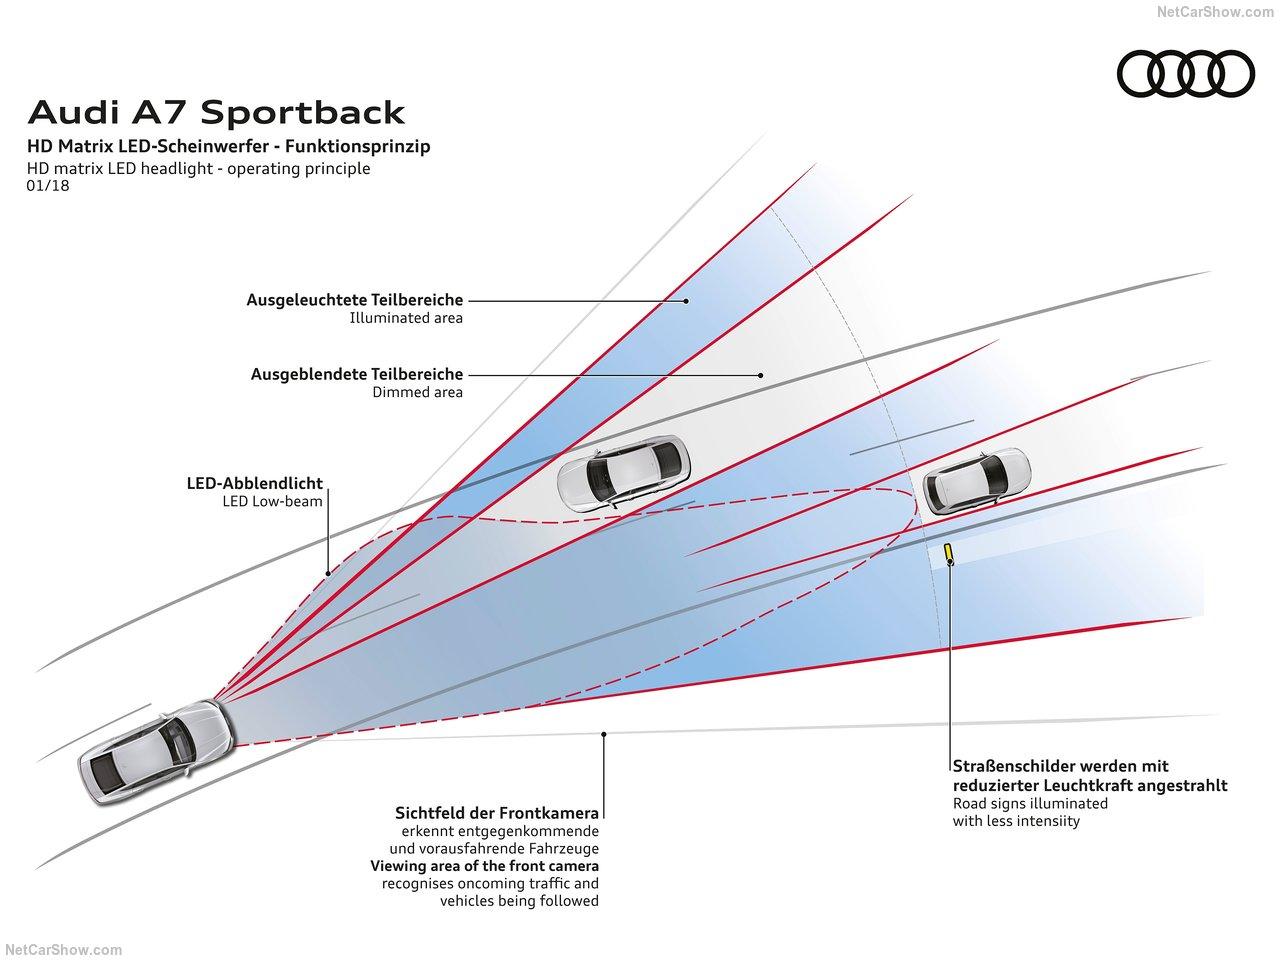 Audi-A7_Sportback-2018-1280-87.jpg